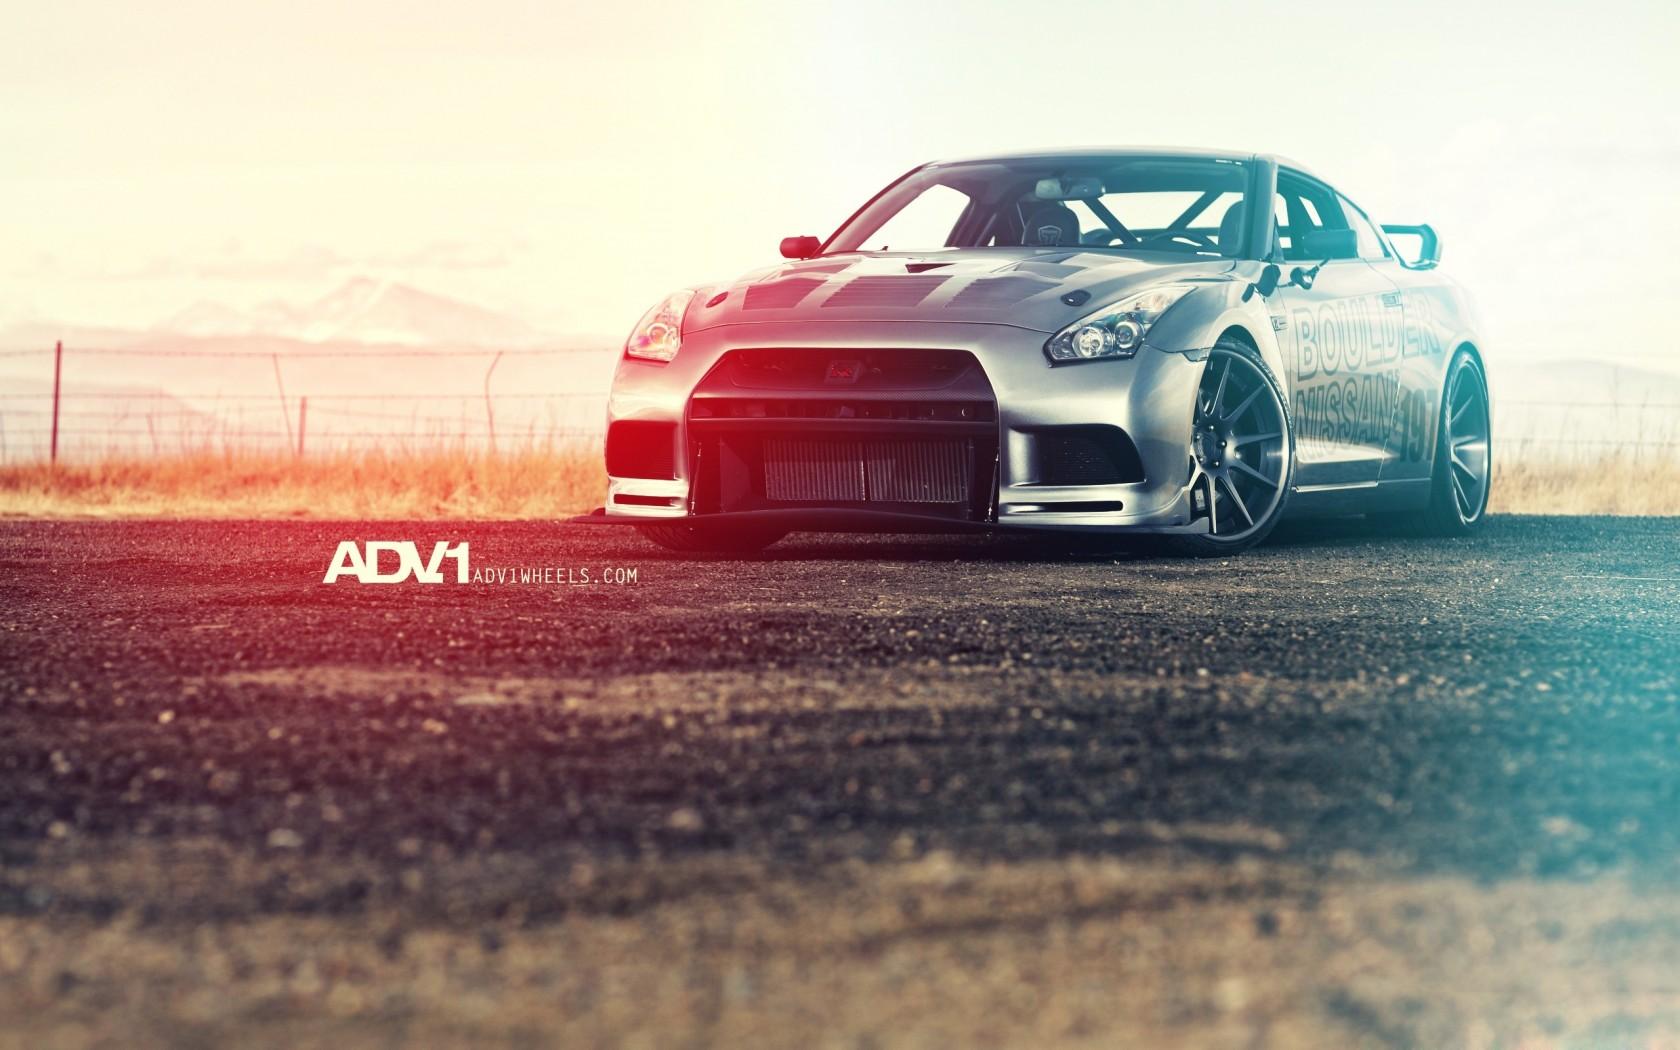 Nissan Gtr Adv1 Wheels Wallpaper Hd Car Wallpapers Id